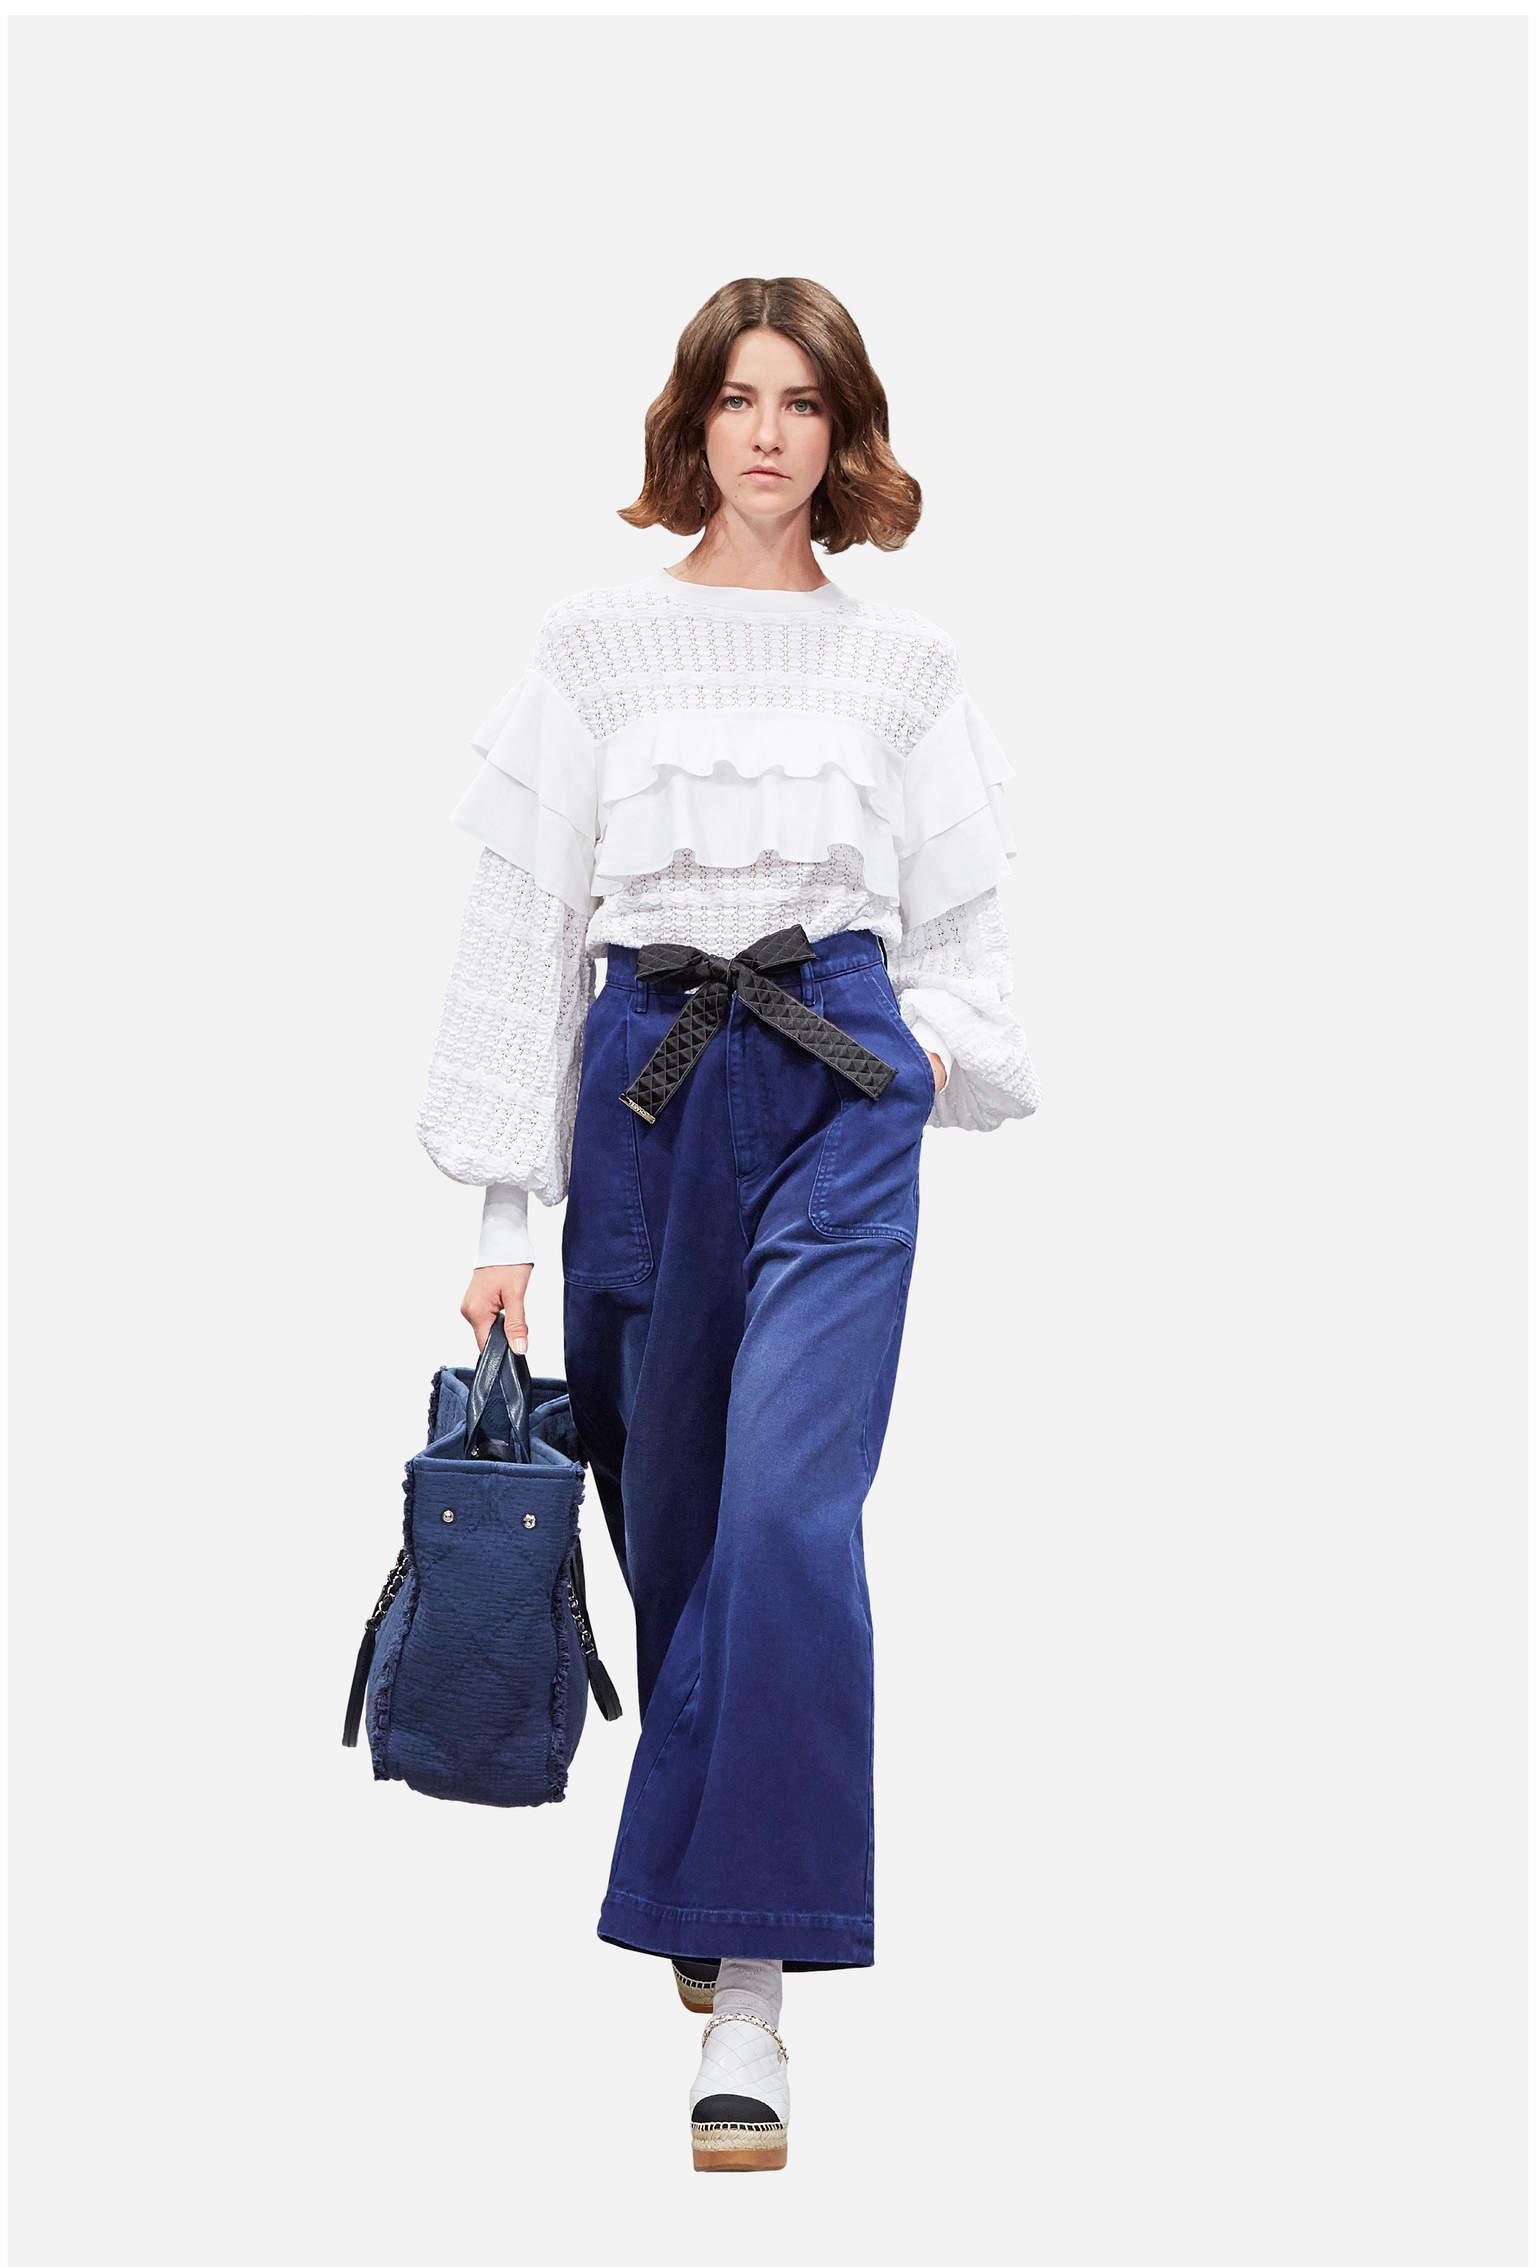 2018春夏新款海軍藍沙灘包 chanel Large shopping bag大號手提包